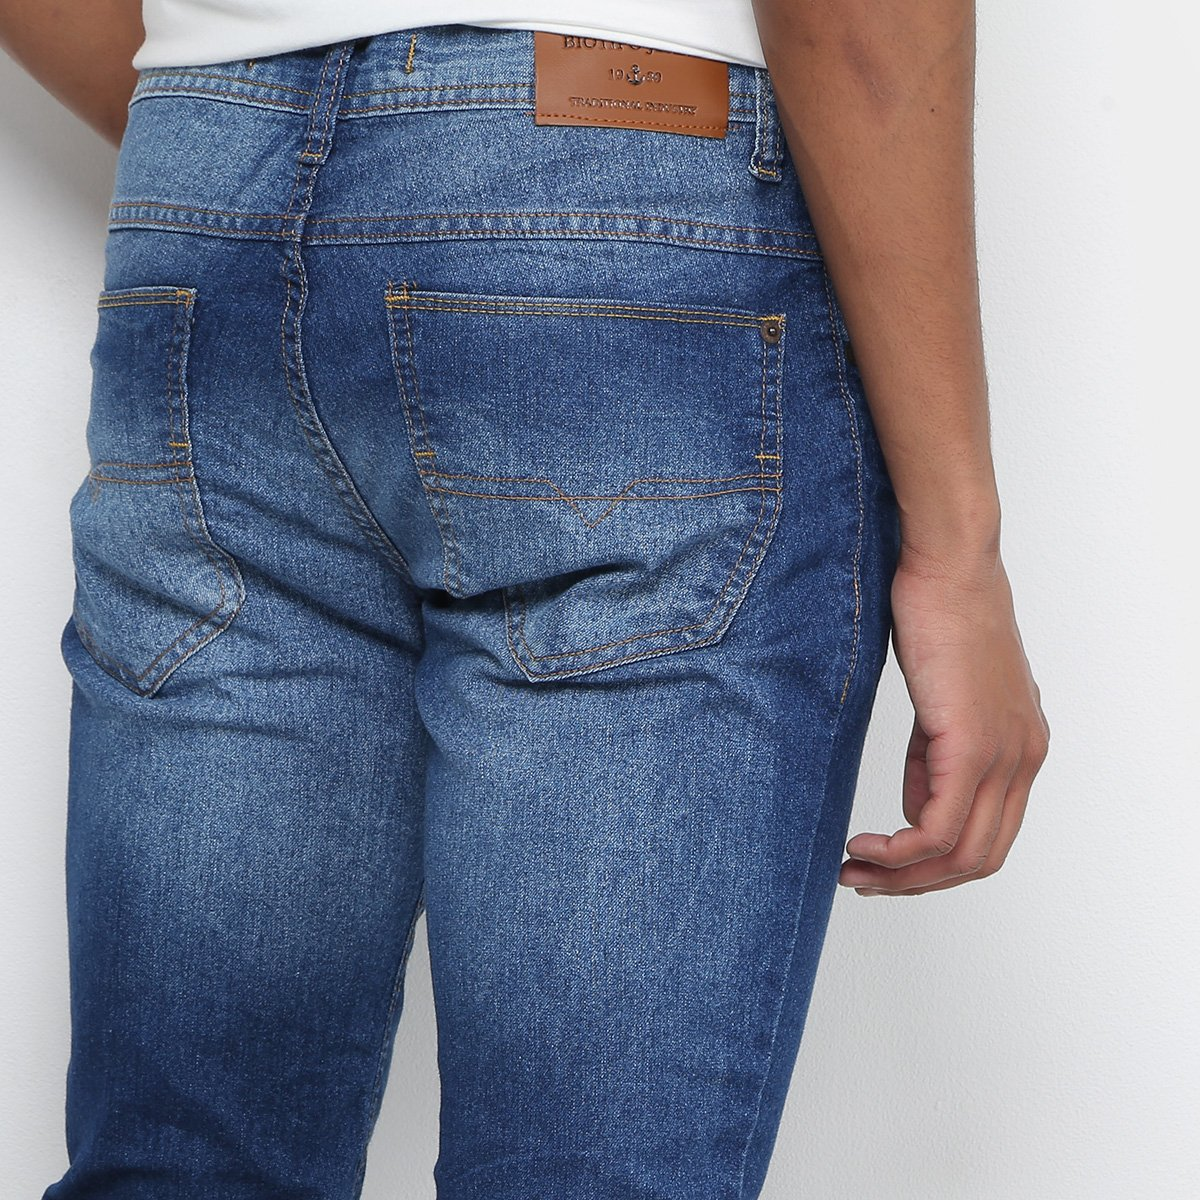 03295592db Calça Jeans Skinny Biotipo Estonada Masculina - Azul - Compre Agora ...